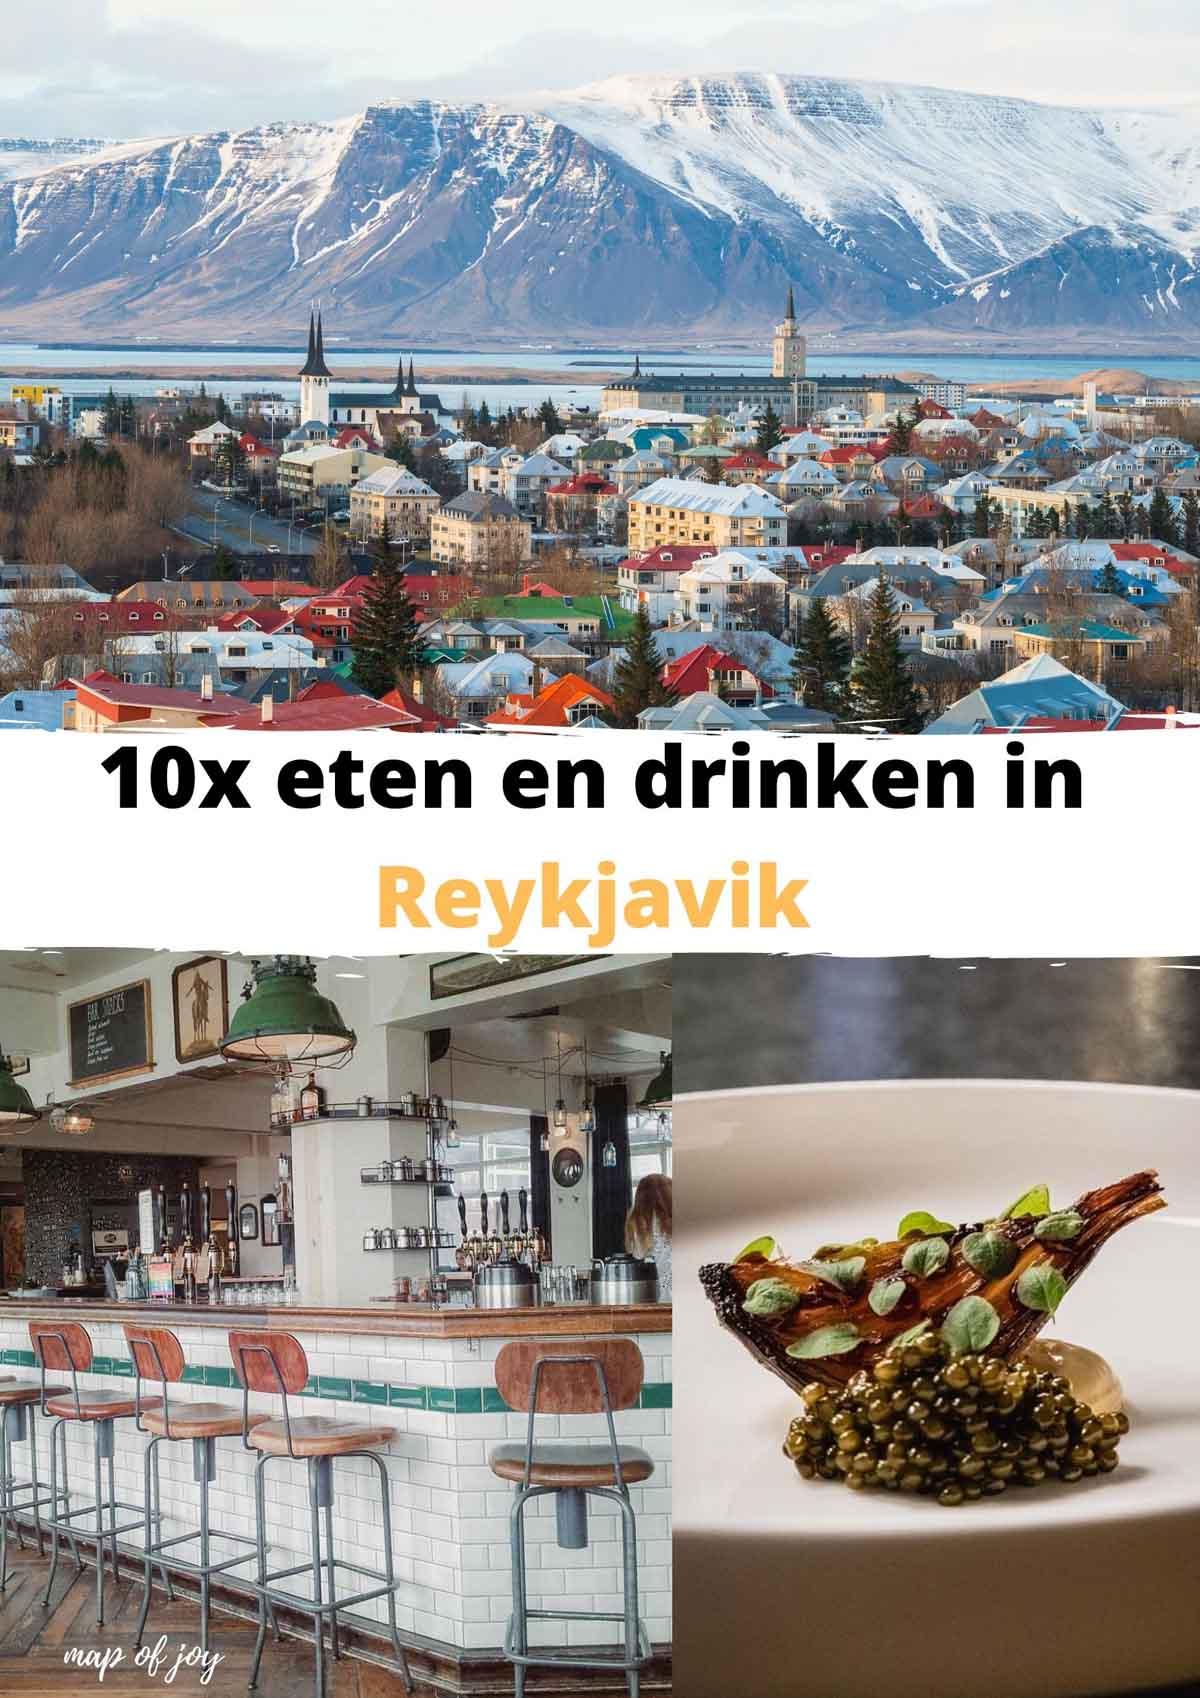 10x de leukste plekken om te eten en drinken in Reykjavik